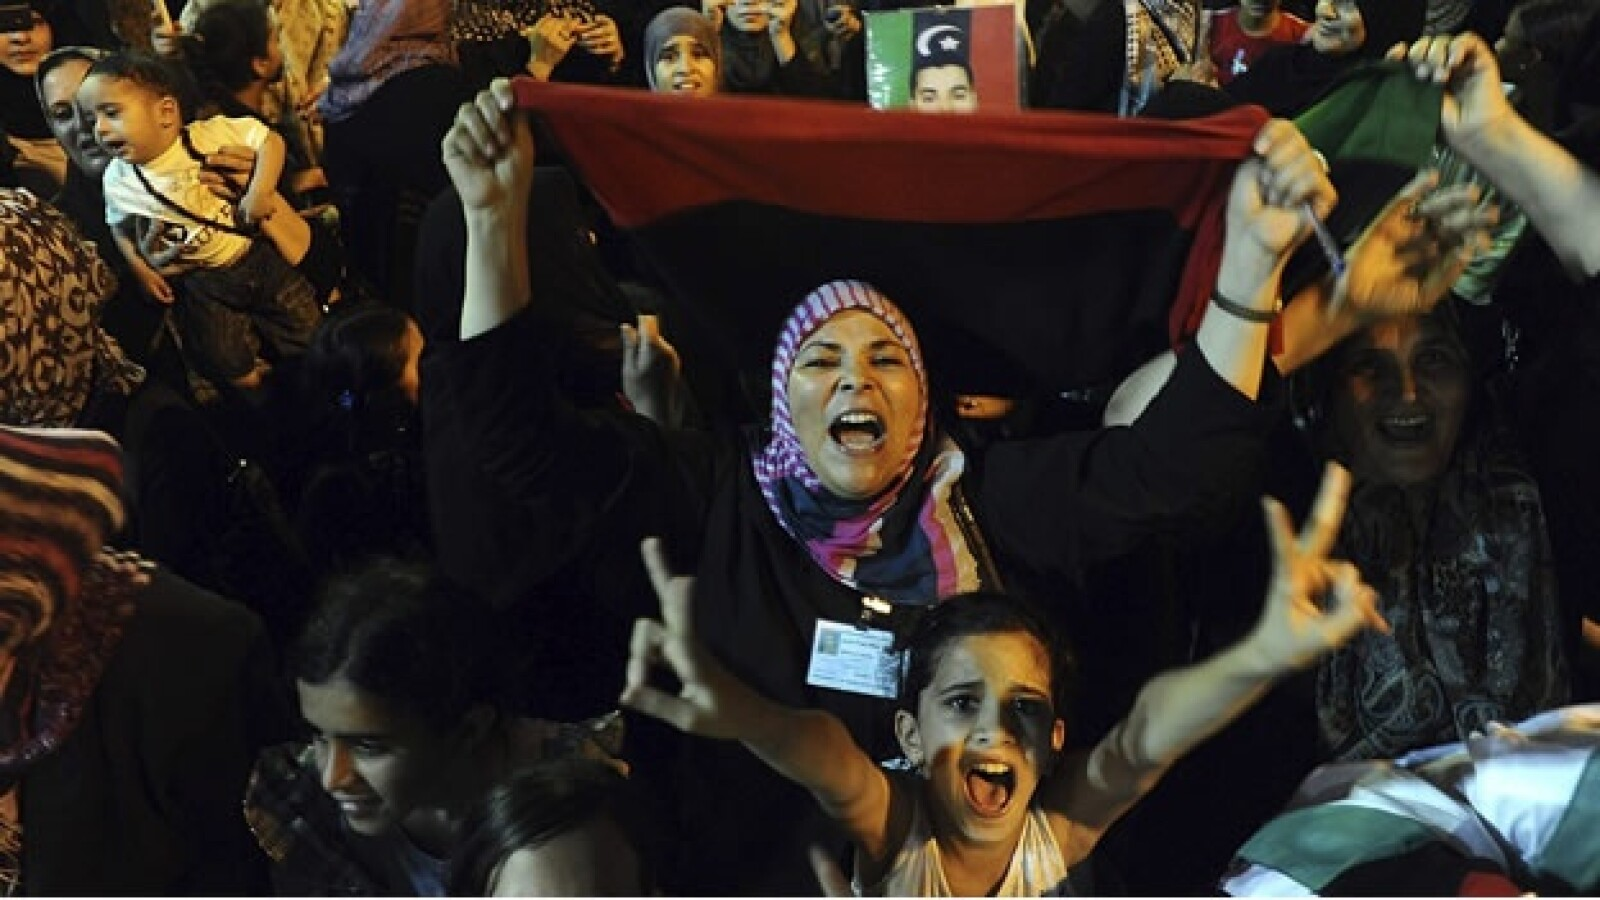 rebeldes Libia Gadhafi Benghazi